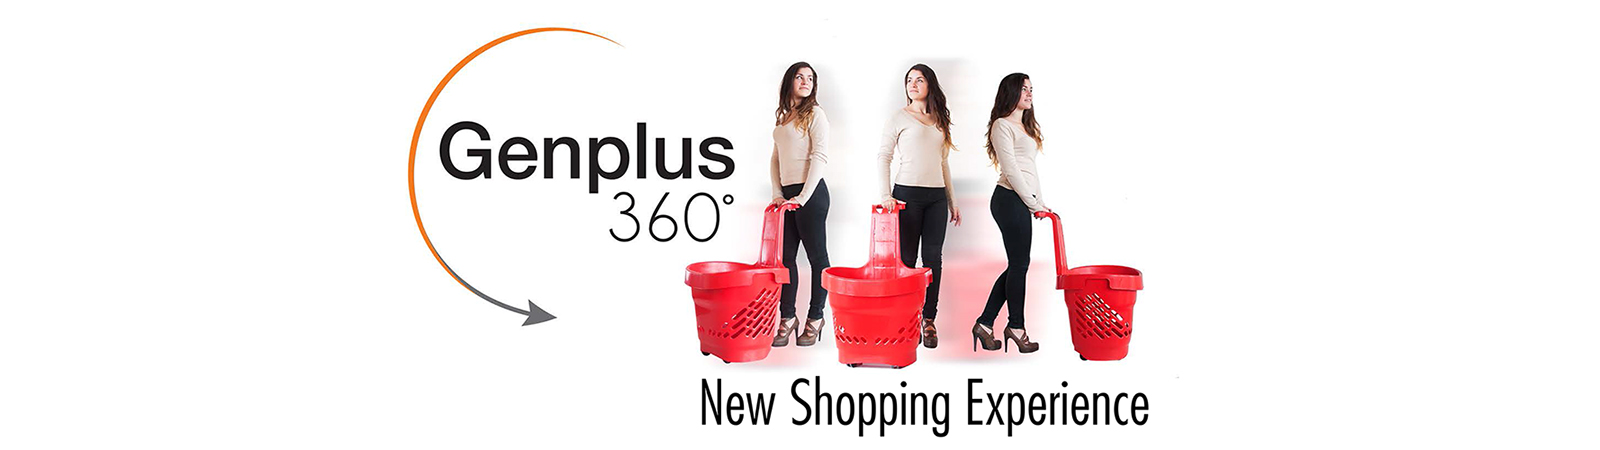 genplus-3